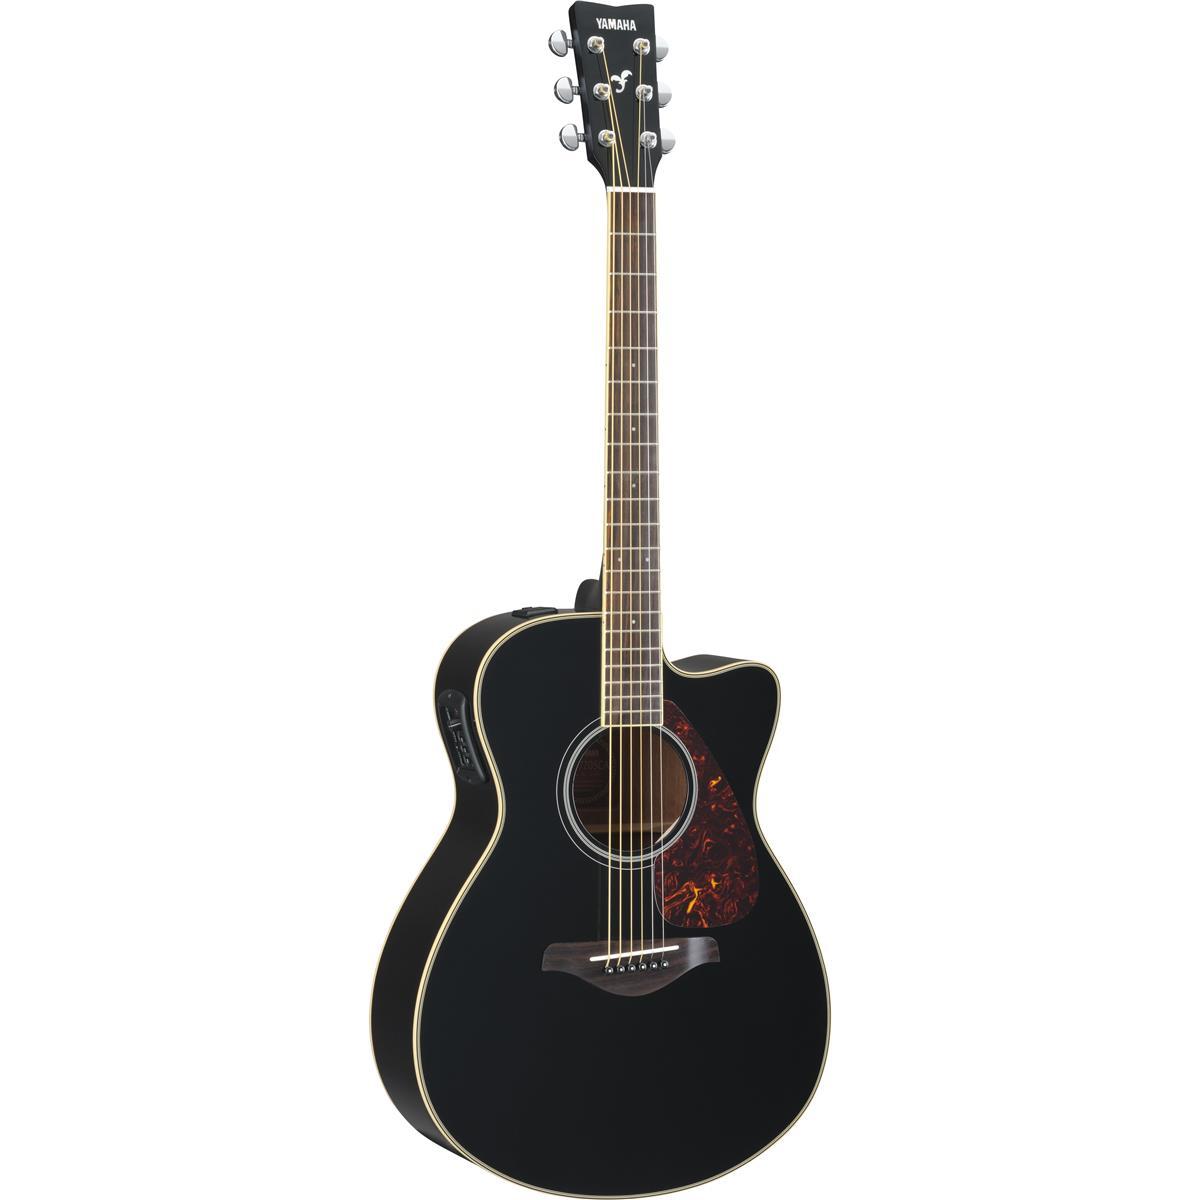 Yamaha FSX720SC Acoustic-Electric Guitar $250 + free shipping